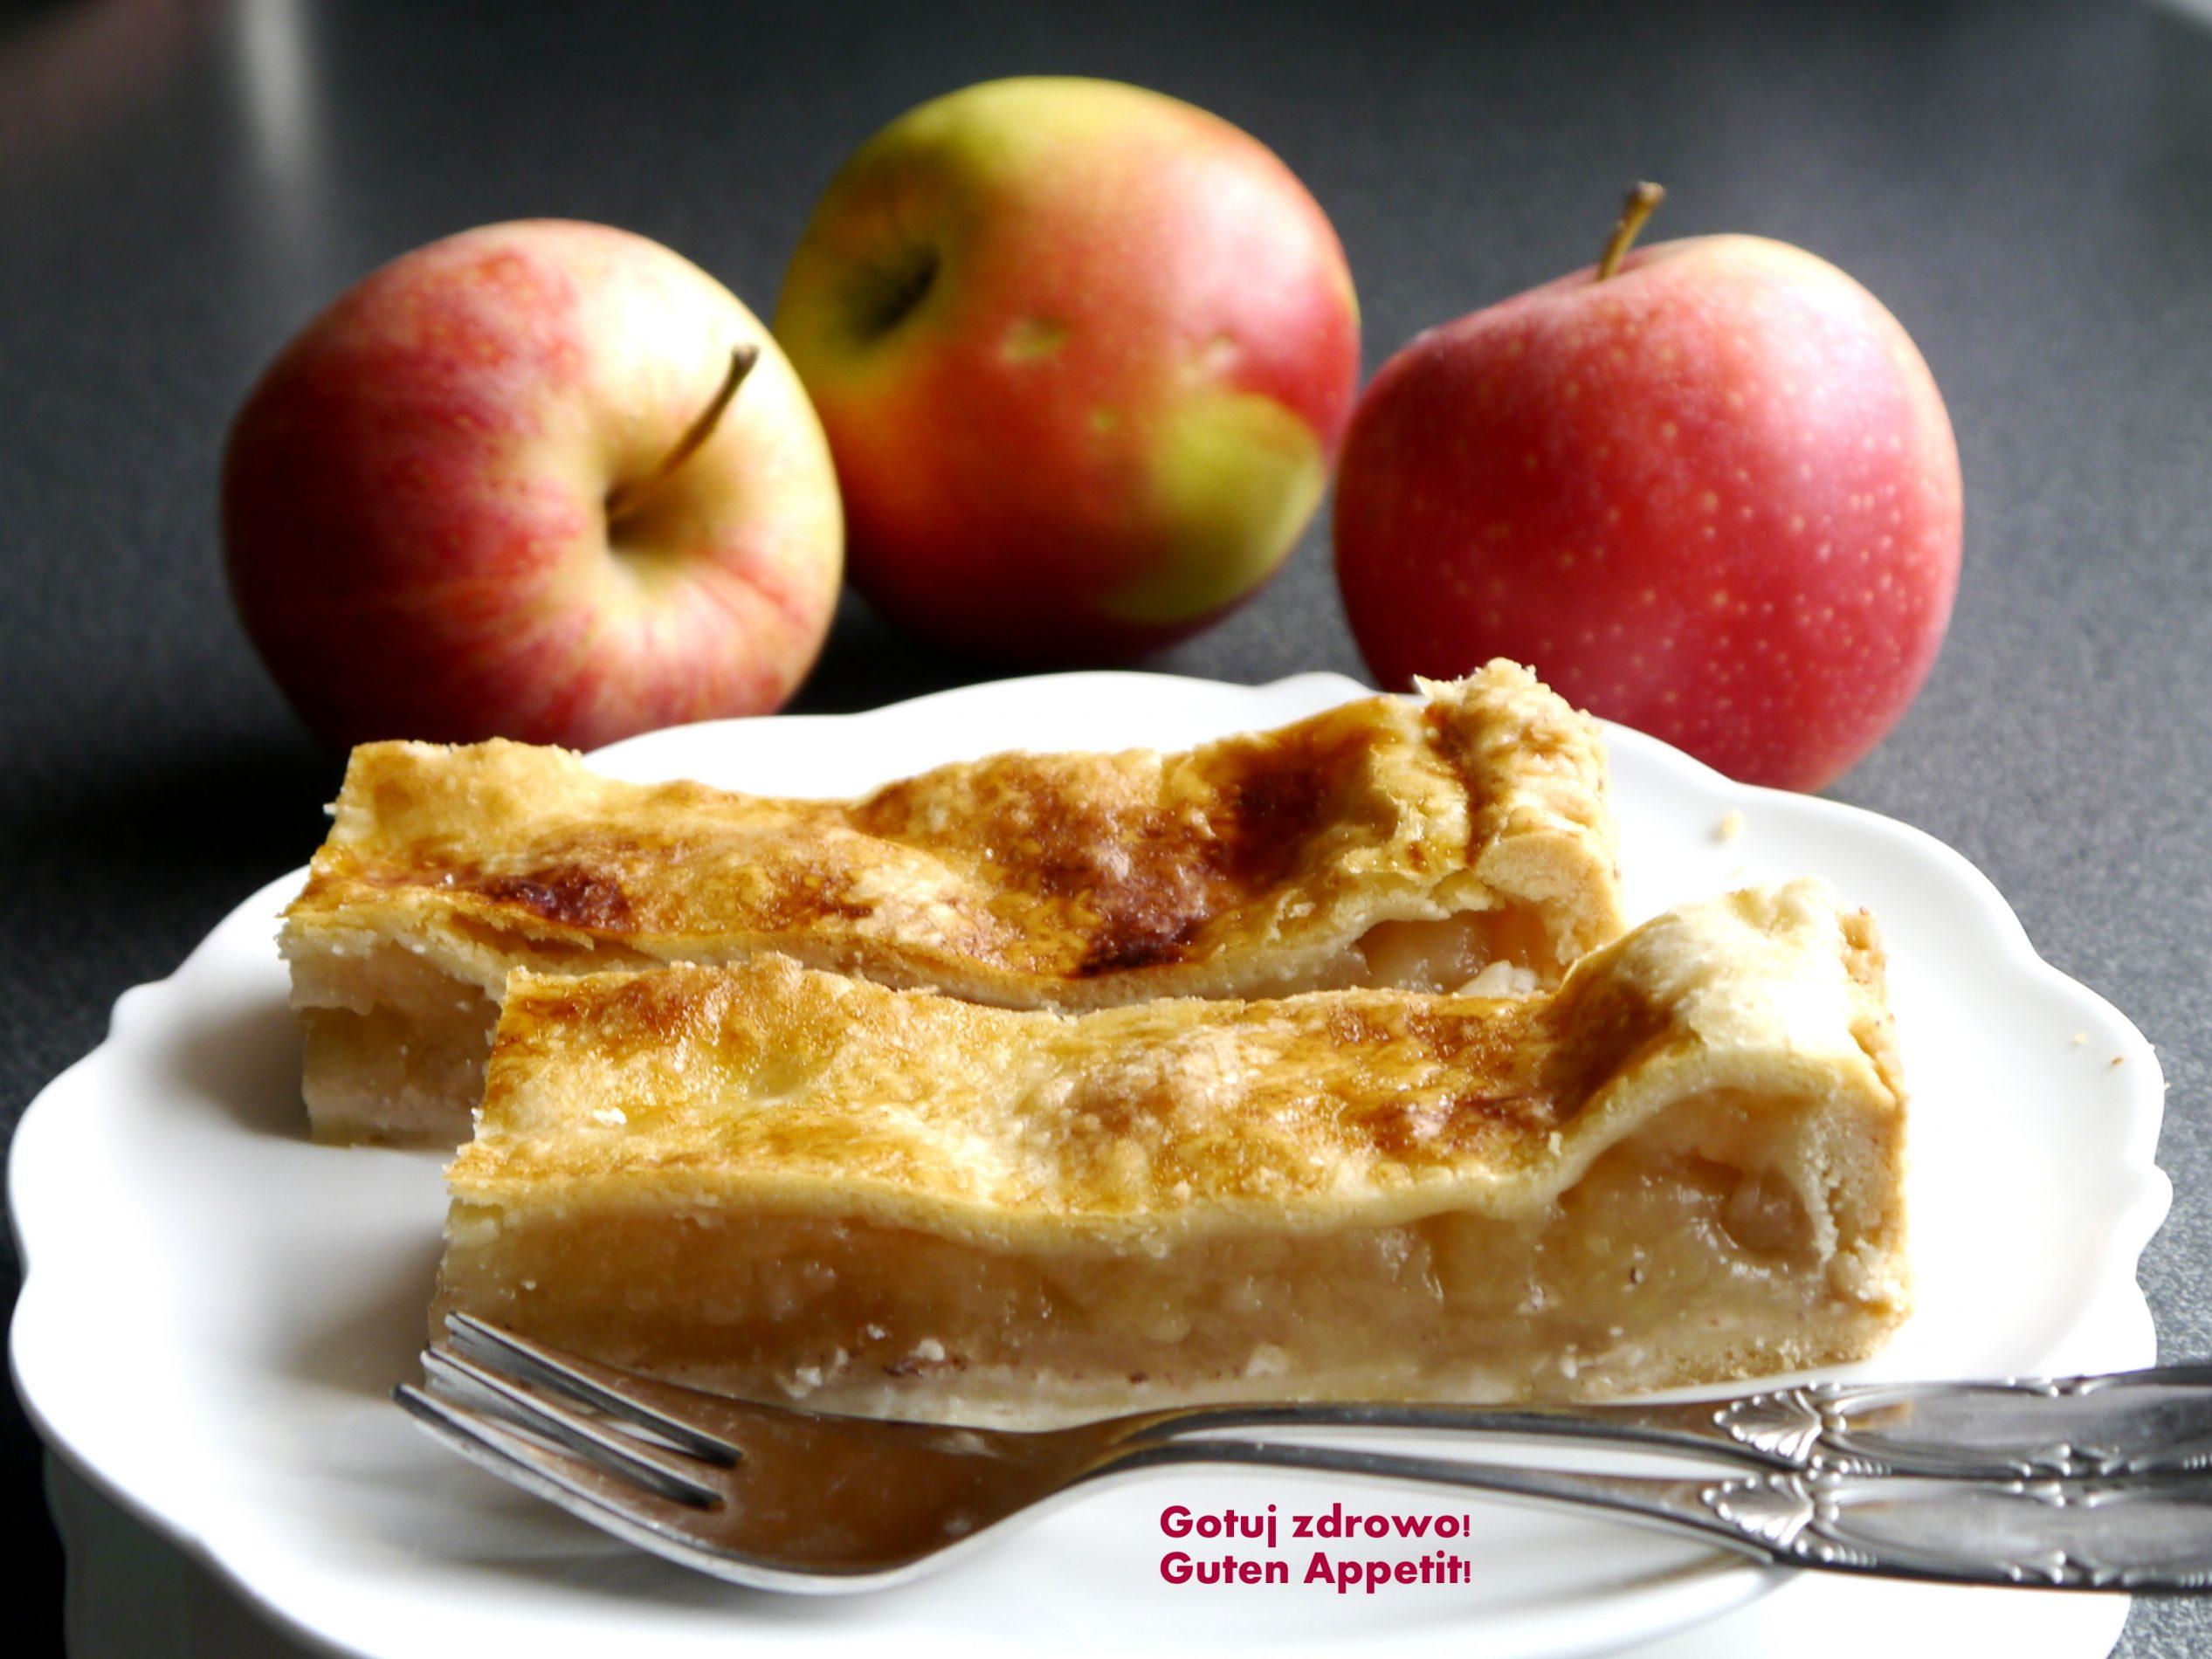 Amerykańska szarlotka - Aplle pie